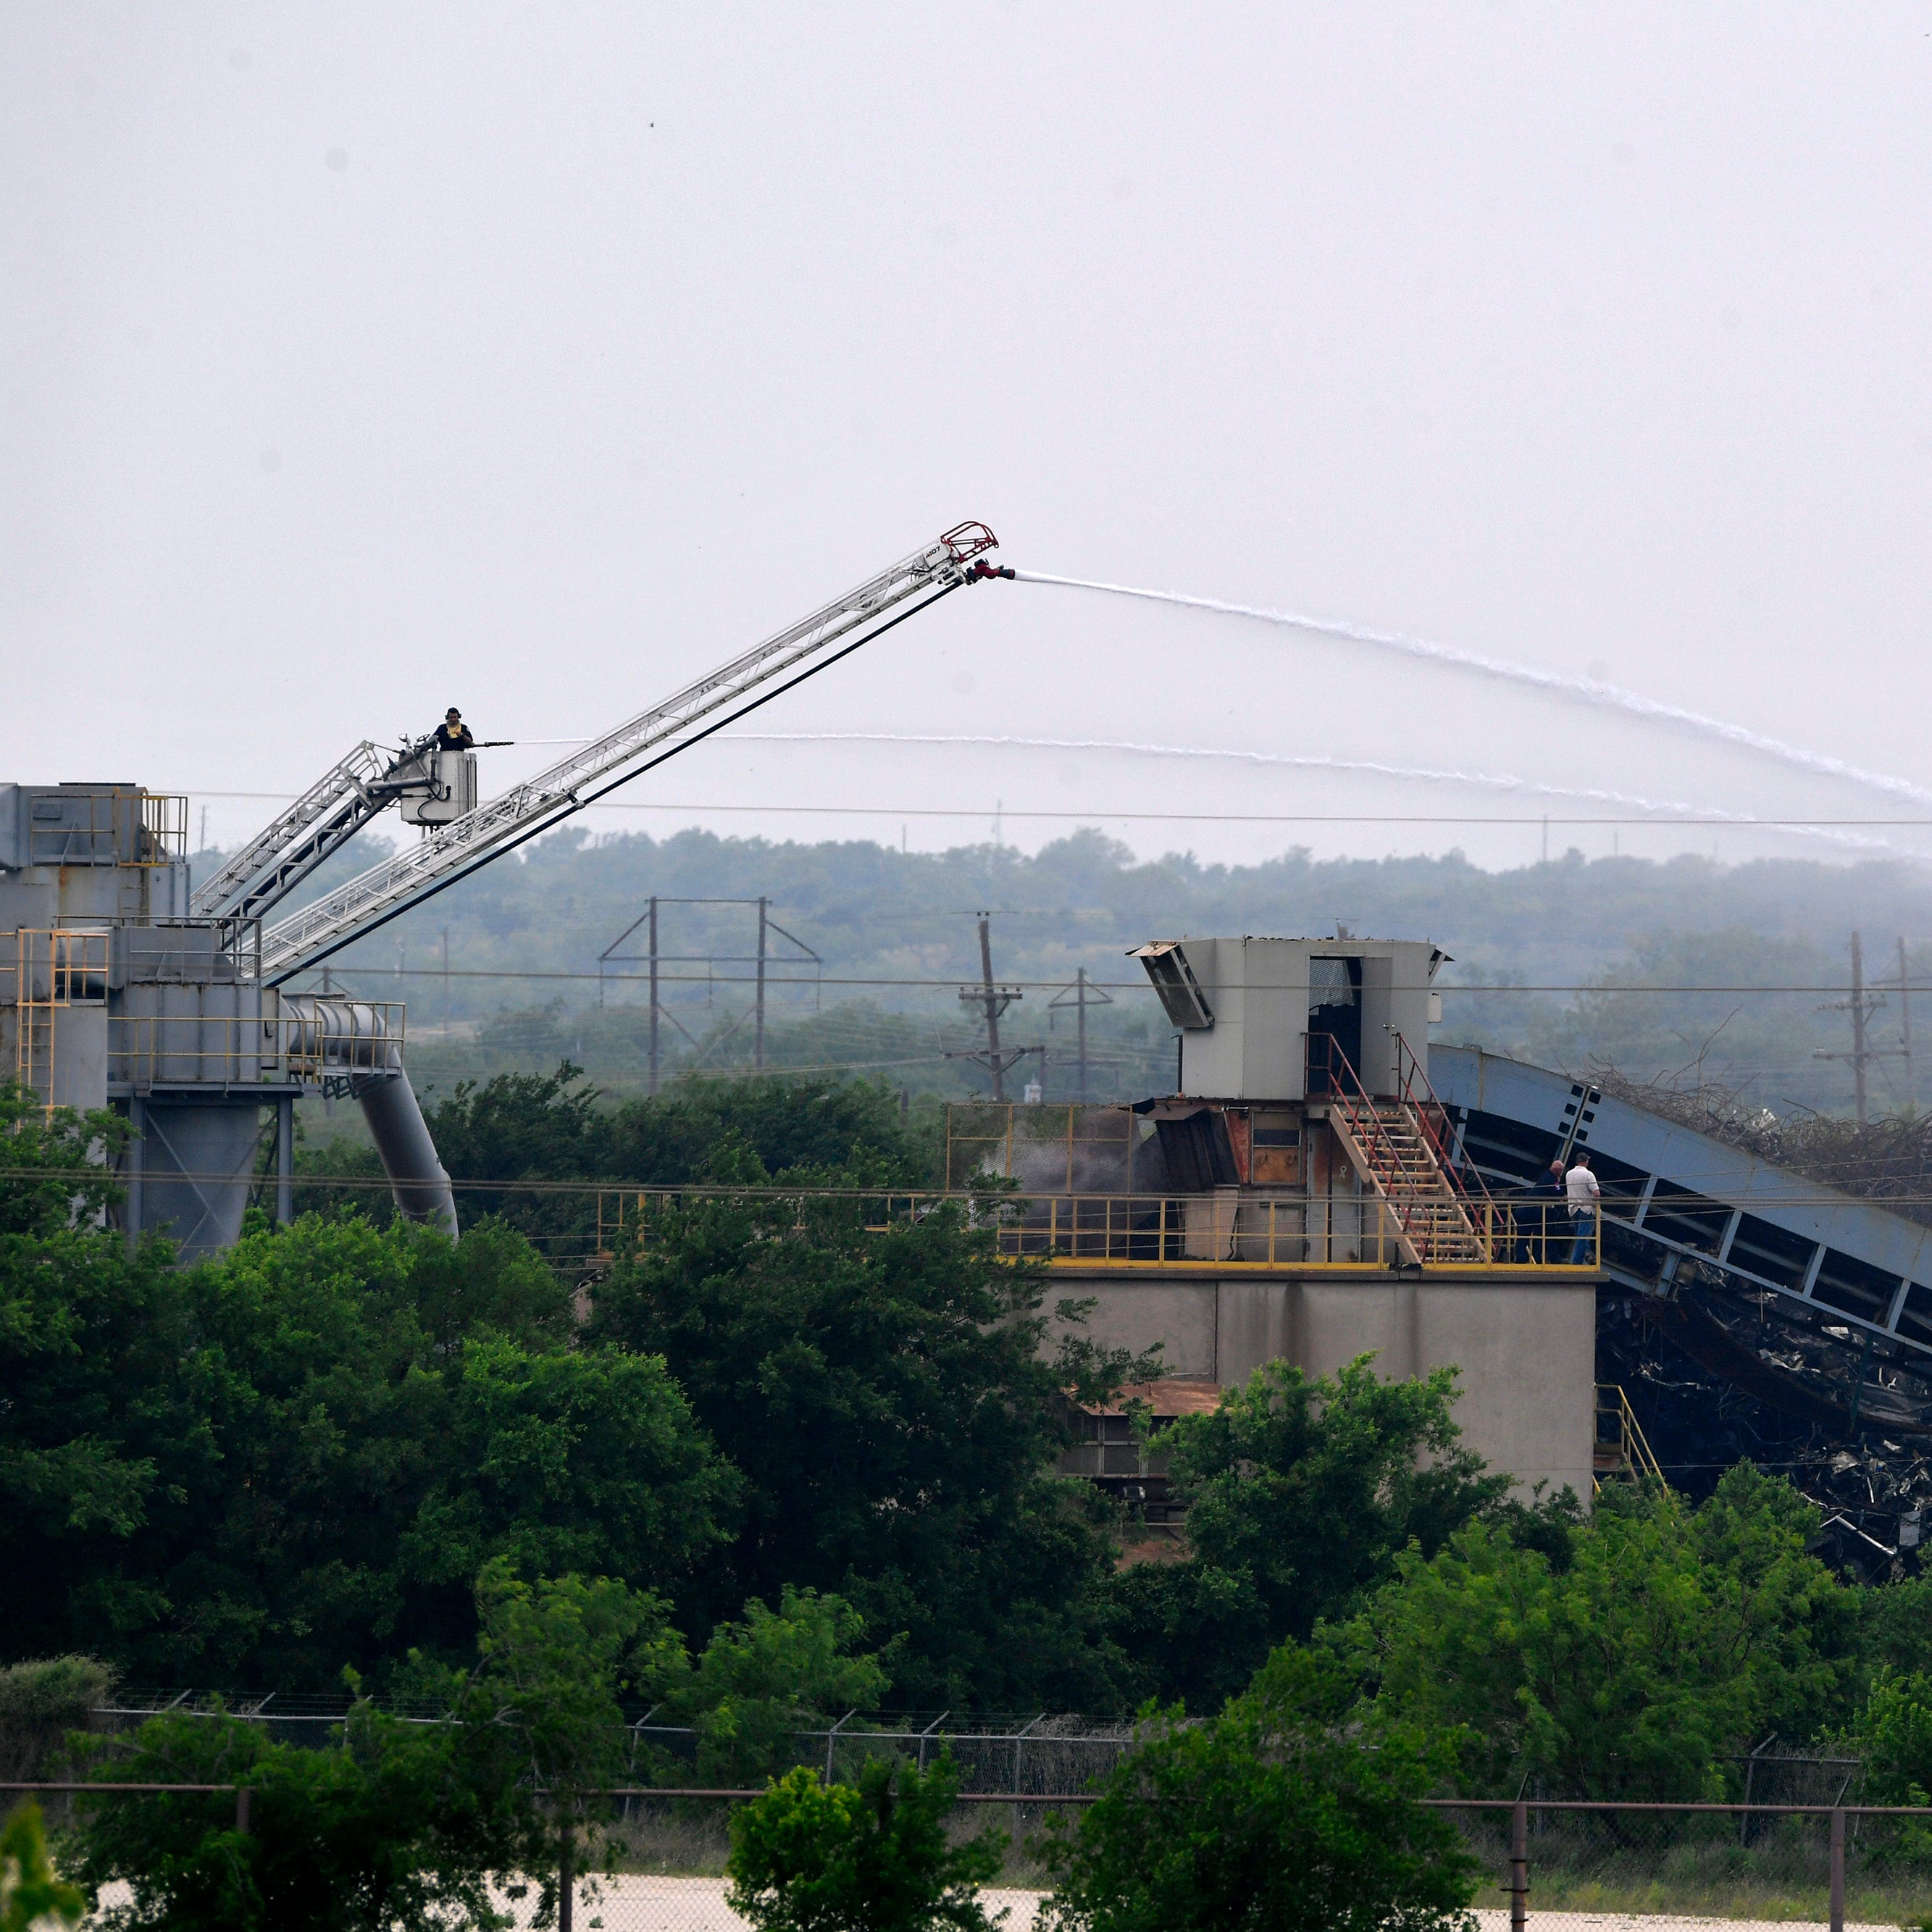 Abilene salvage yard debris still smoldering Wednesday after fire